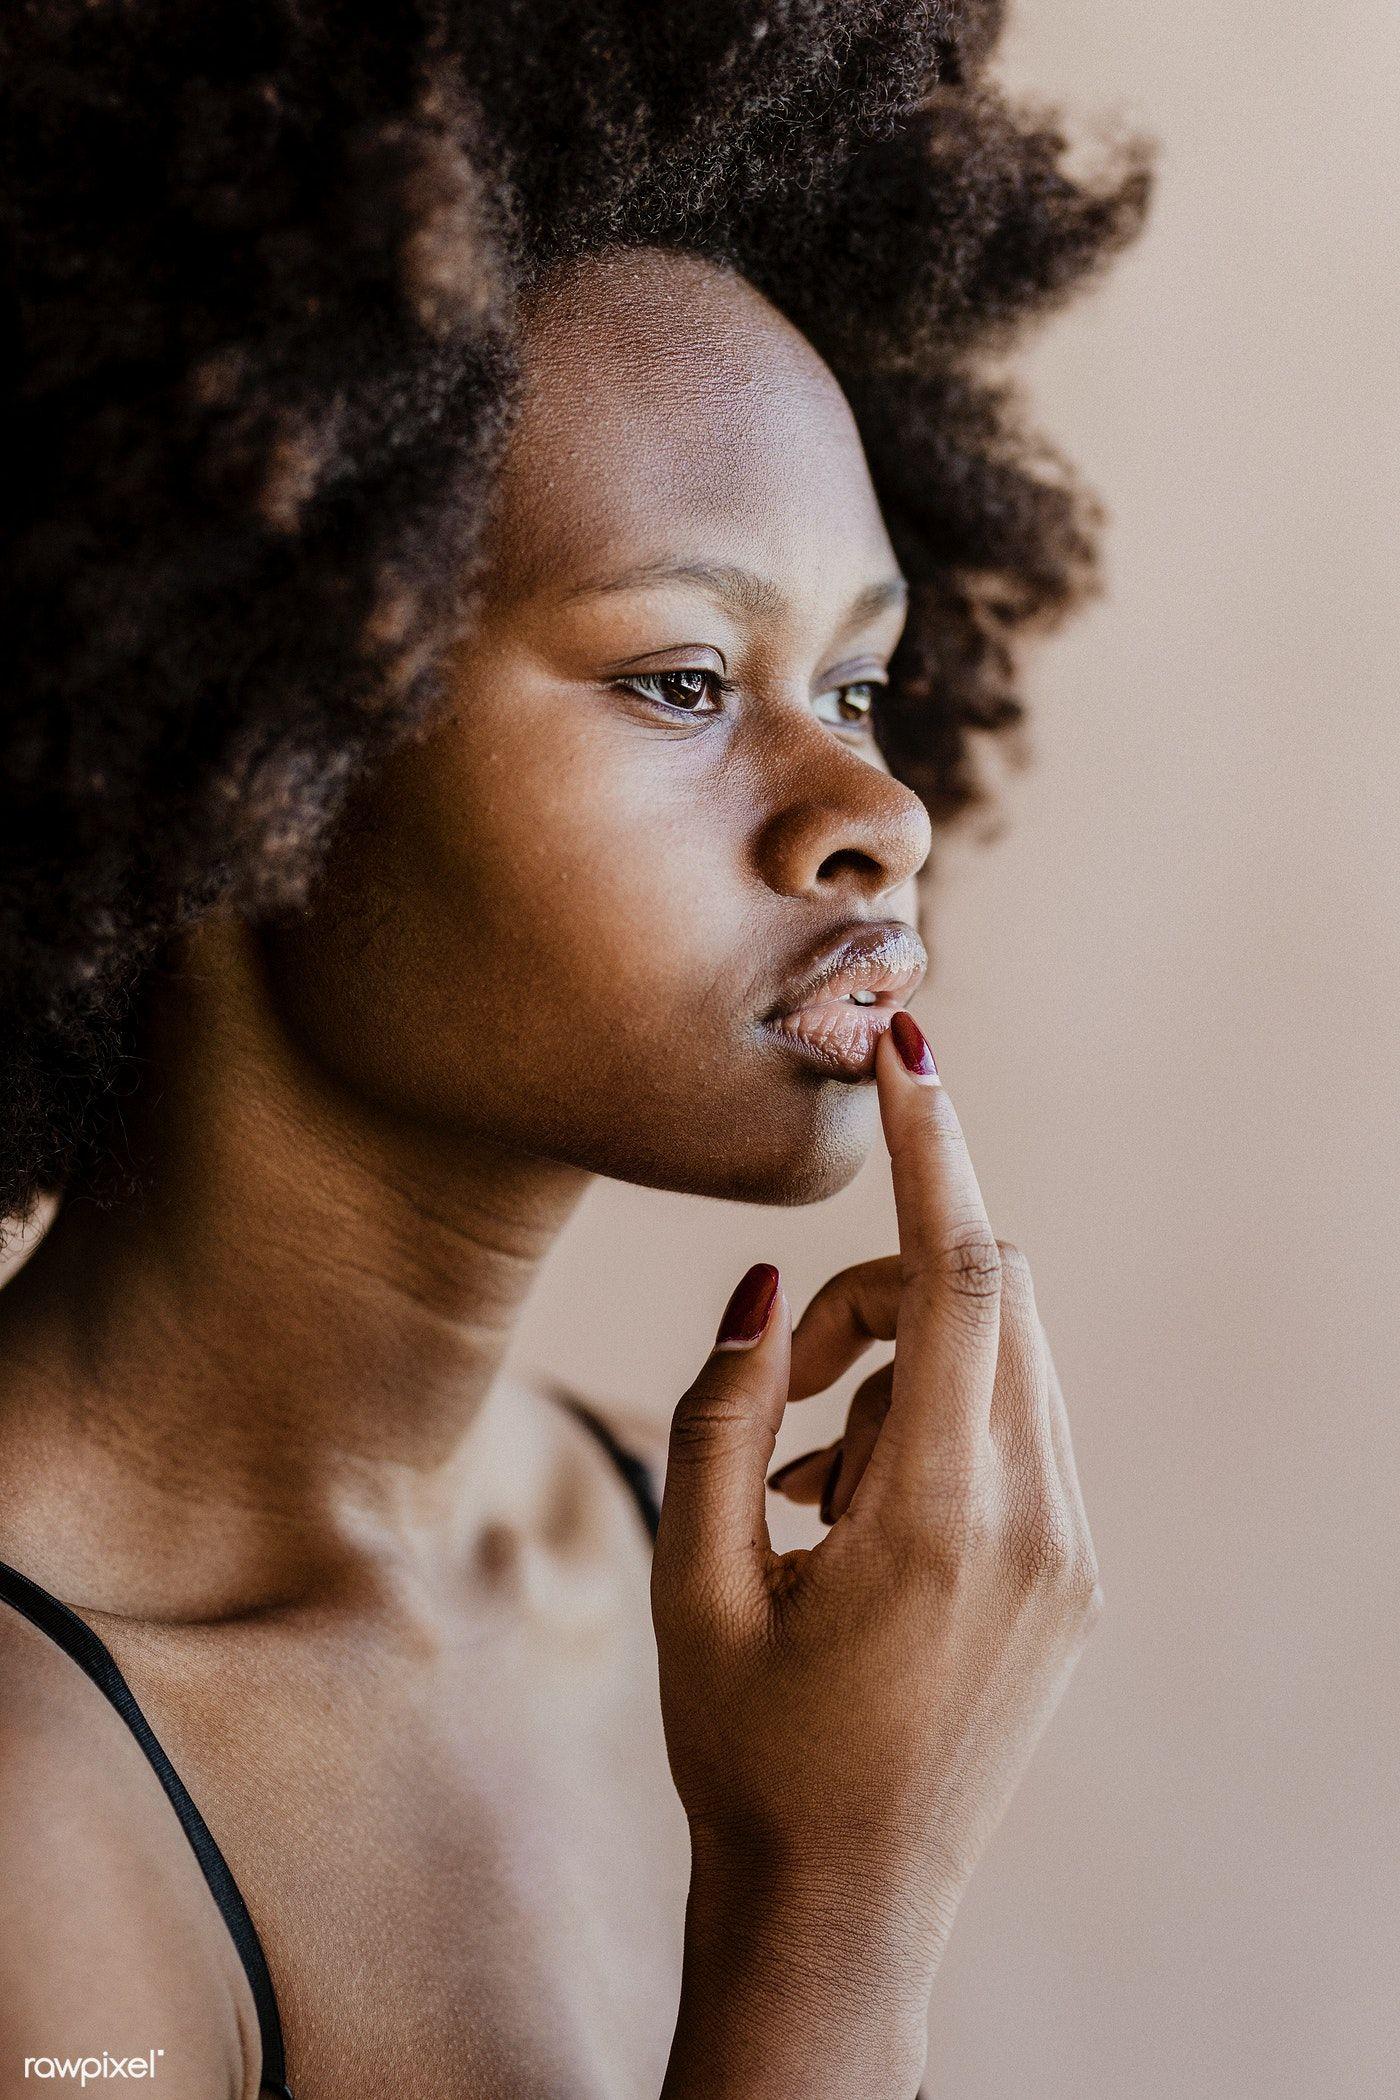 Download Premium Image Of Beautiful Black Woman With Afro Hair 2025330 Beautiful Black Women Black Beauty Women Afro Hairstyles